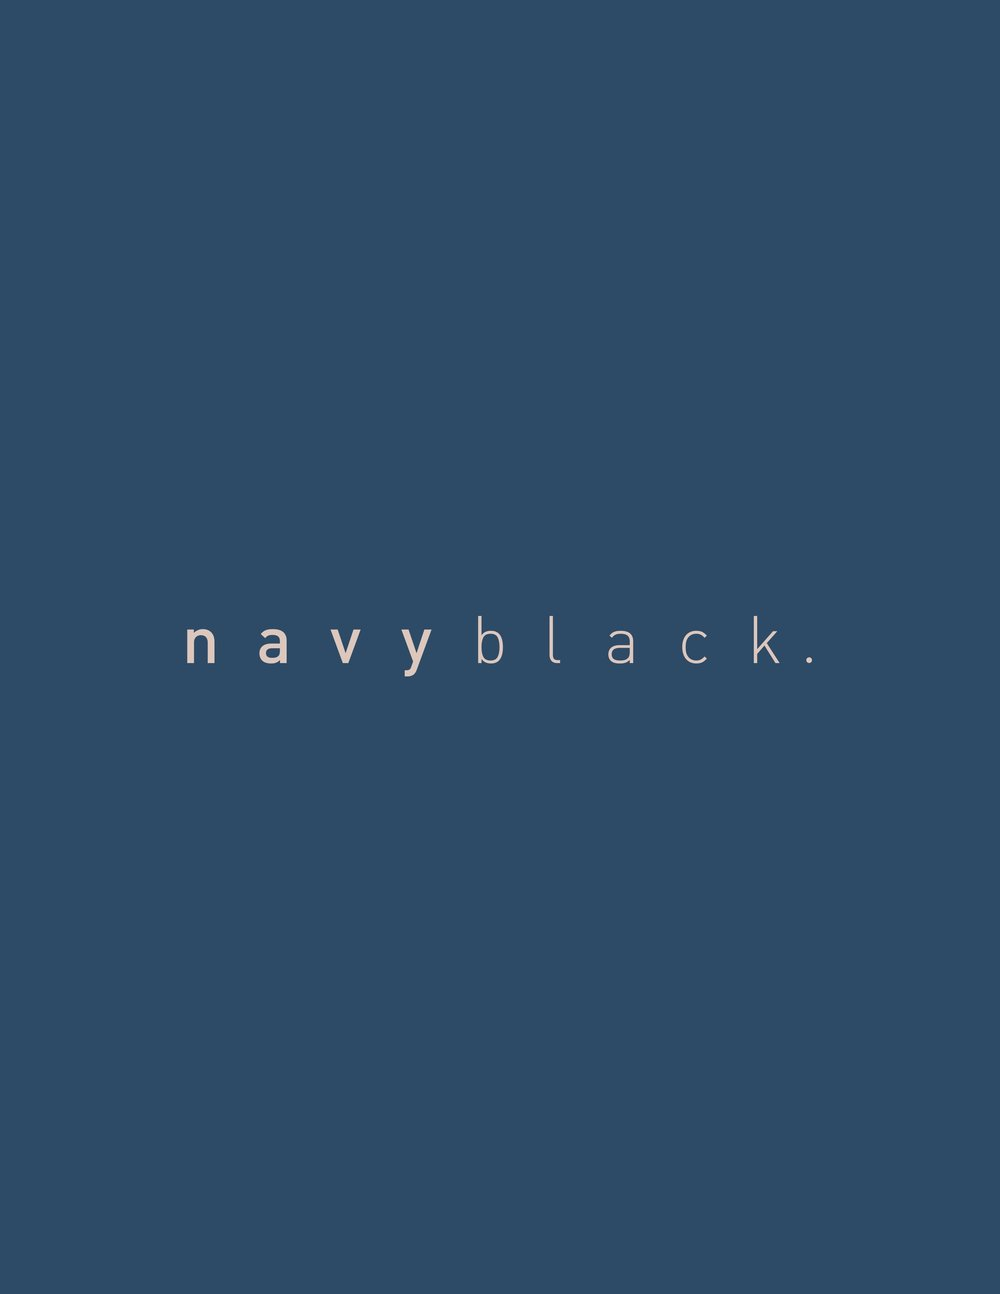 navyblack_look_book17.jpg